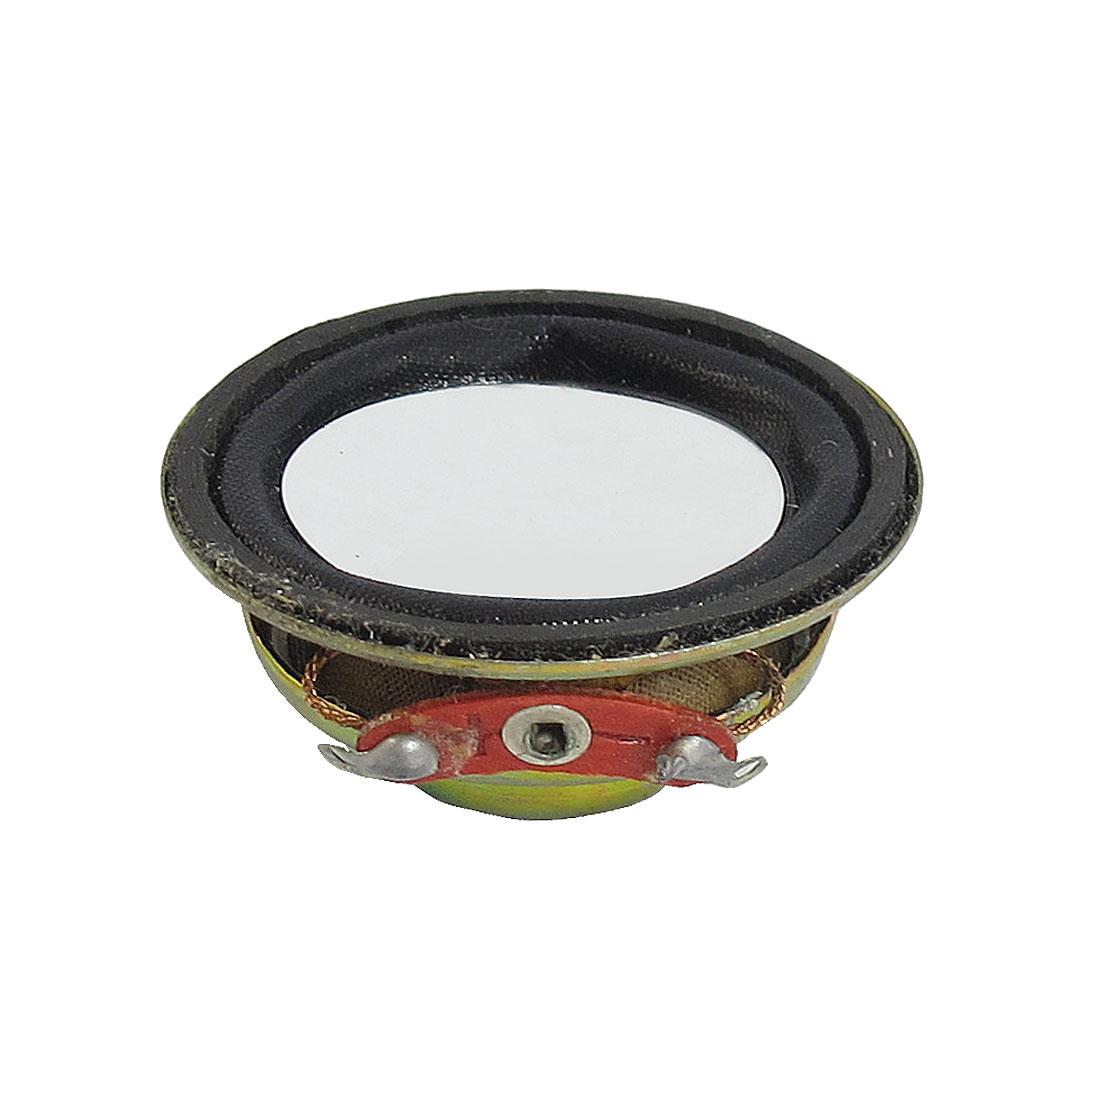 2W 2 Watt 4 Ohm 36mm Dia Aluminum Shell Internal Magnet Speaker